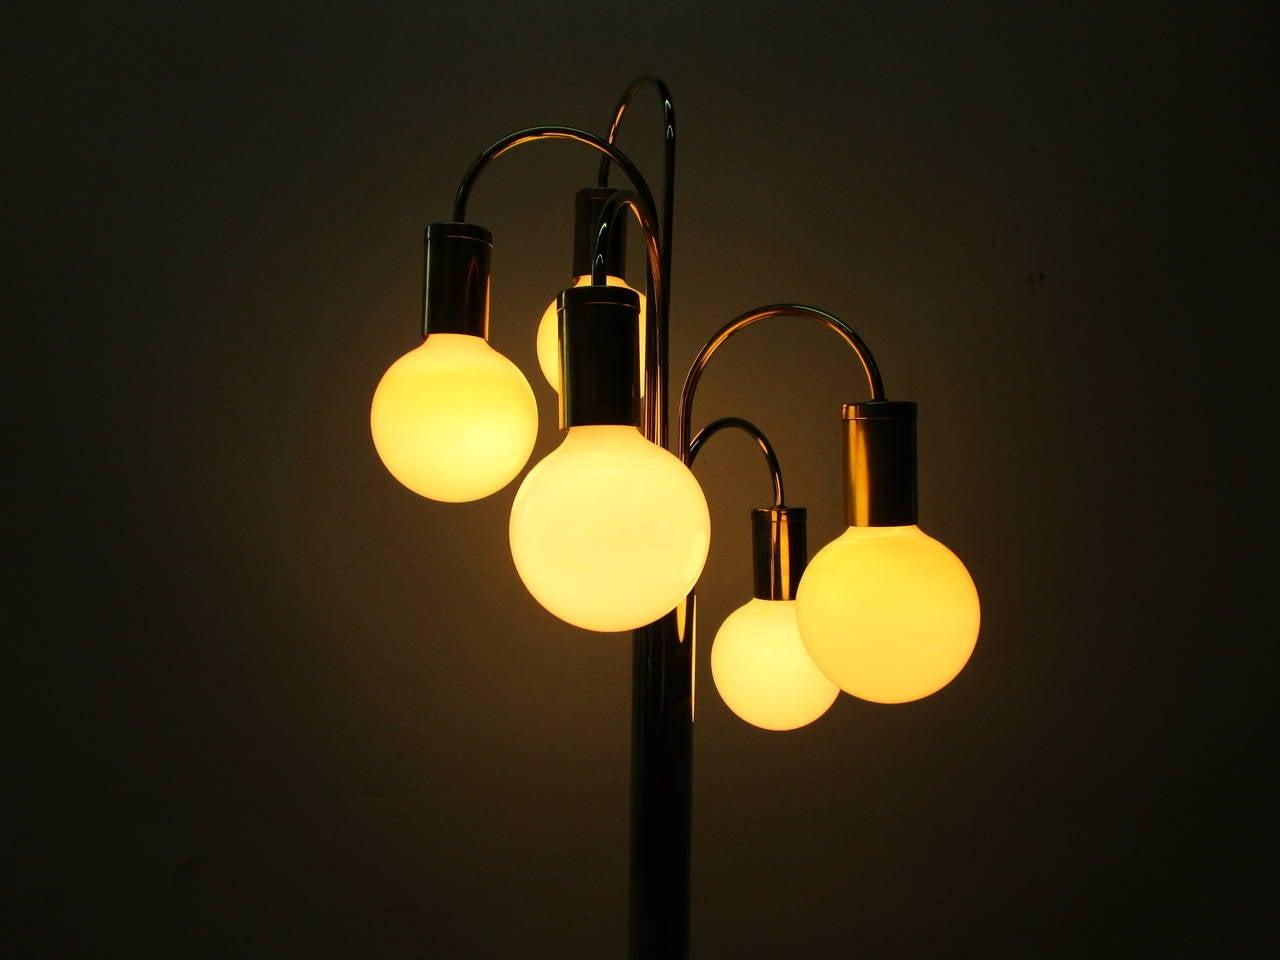 Waterfall Five-Arm Brass  Floor Lamp by Robert Sonneman 1